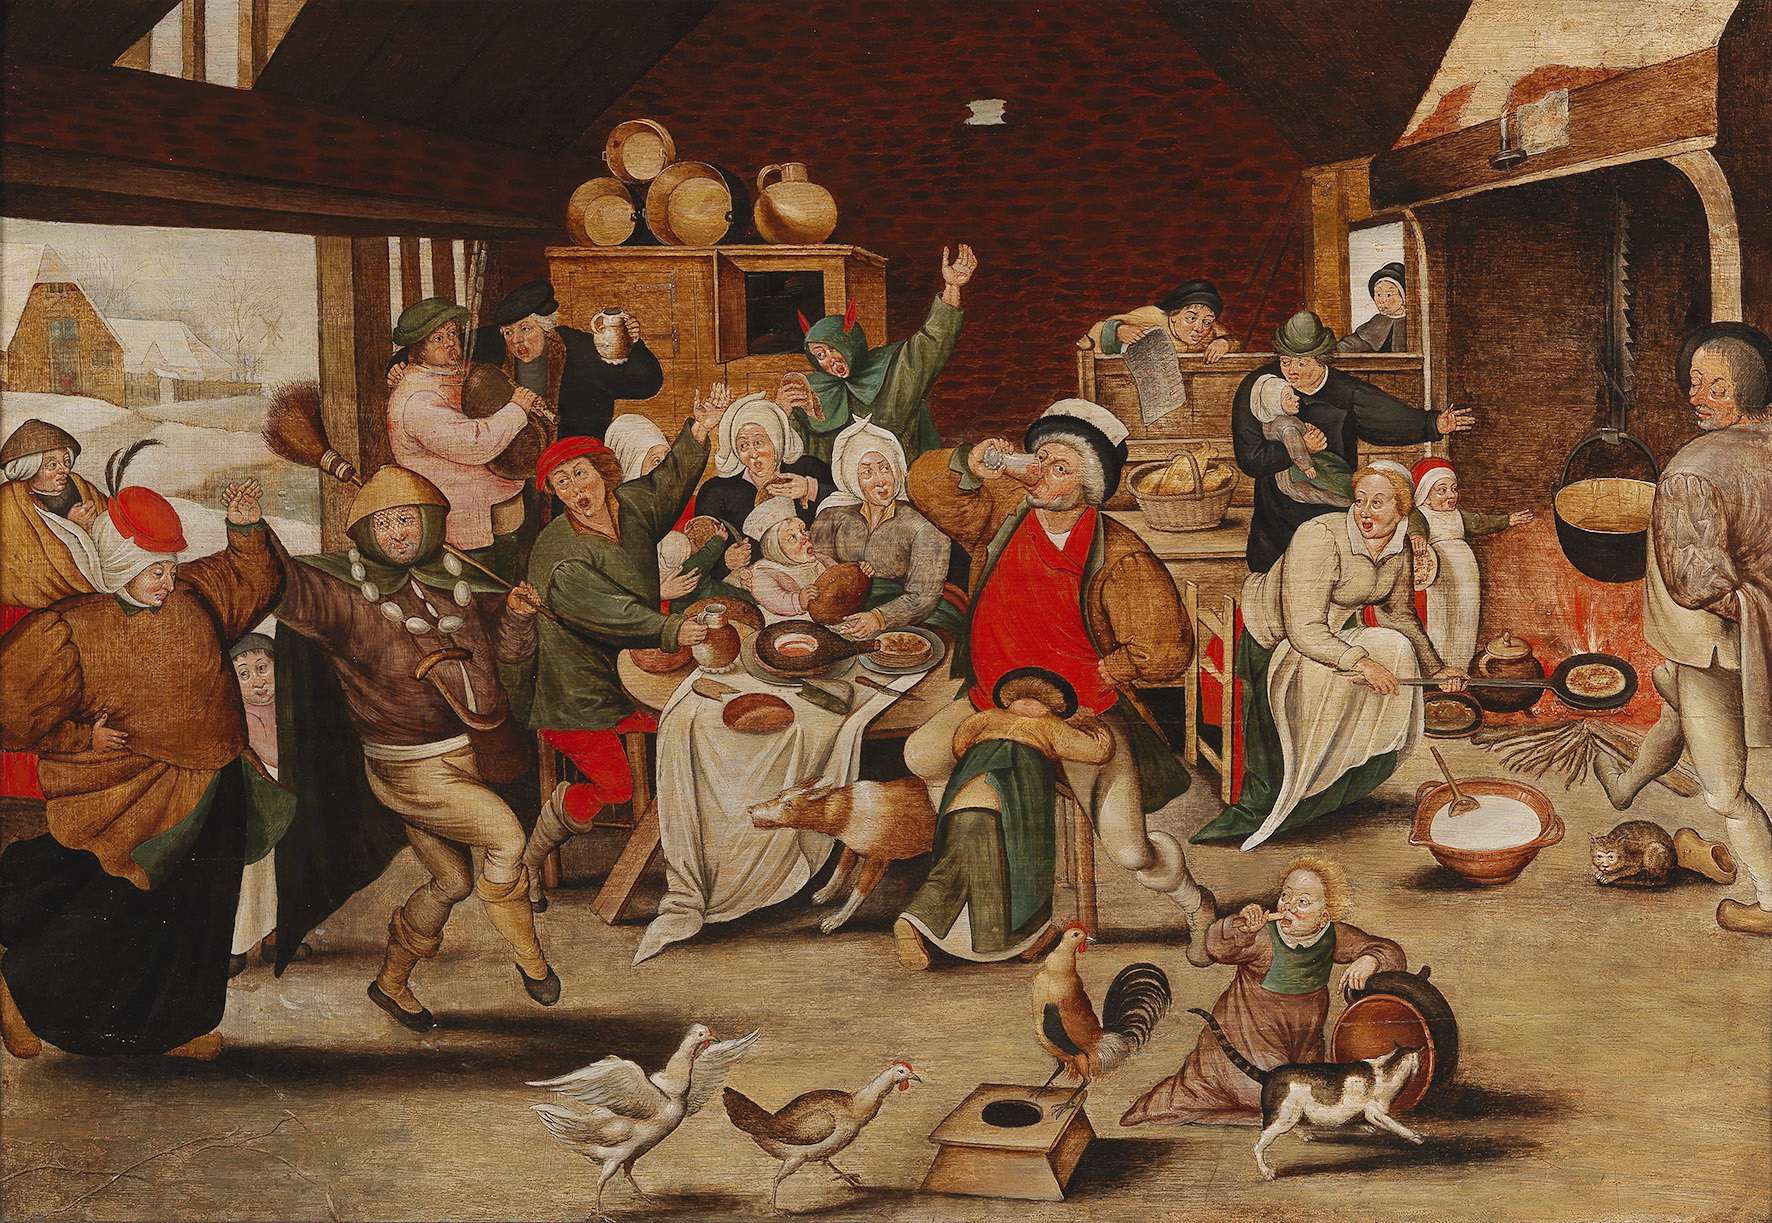 PIETER BRUEGHEL D. J. (1564/65 Brüssel – 1637/38 Antwerpen) - Der König trinkt, Öl/Holz, signiert